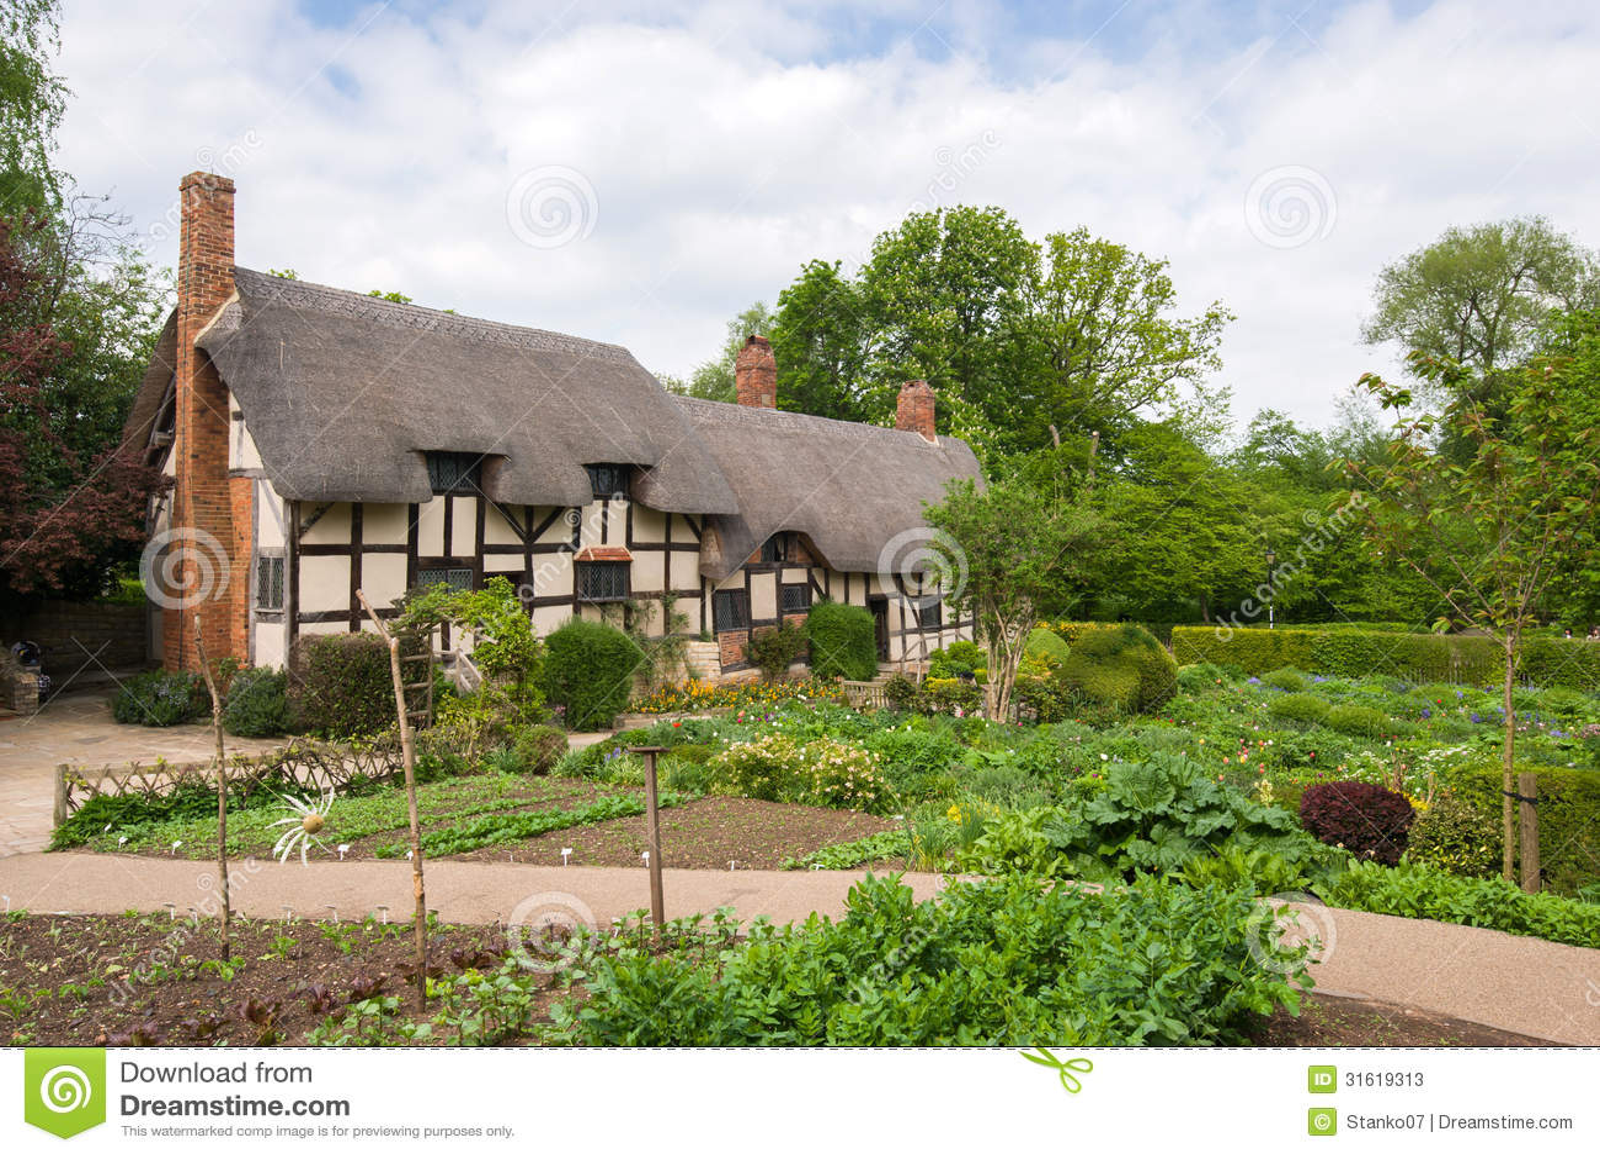 Vieux cottage anglais rural photos stock image 31619313 for Photos cottages anglais